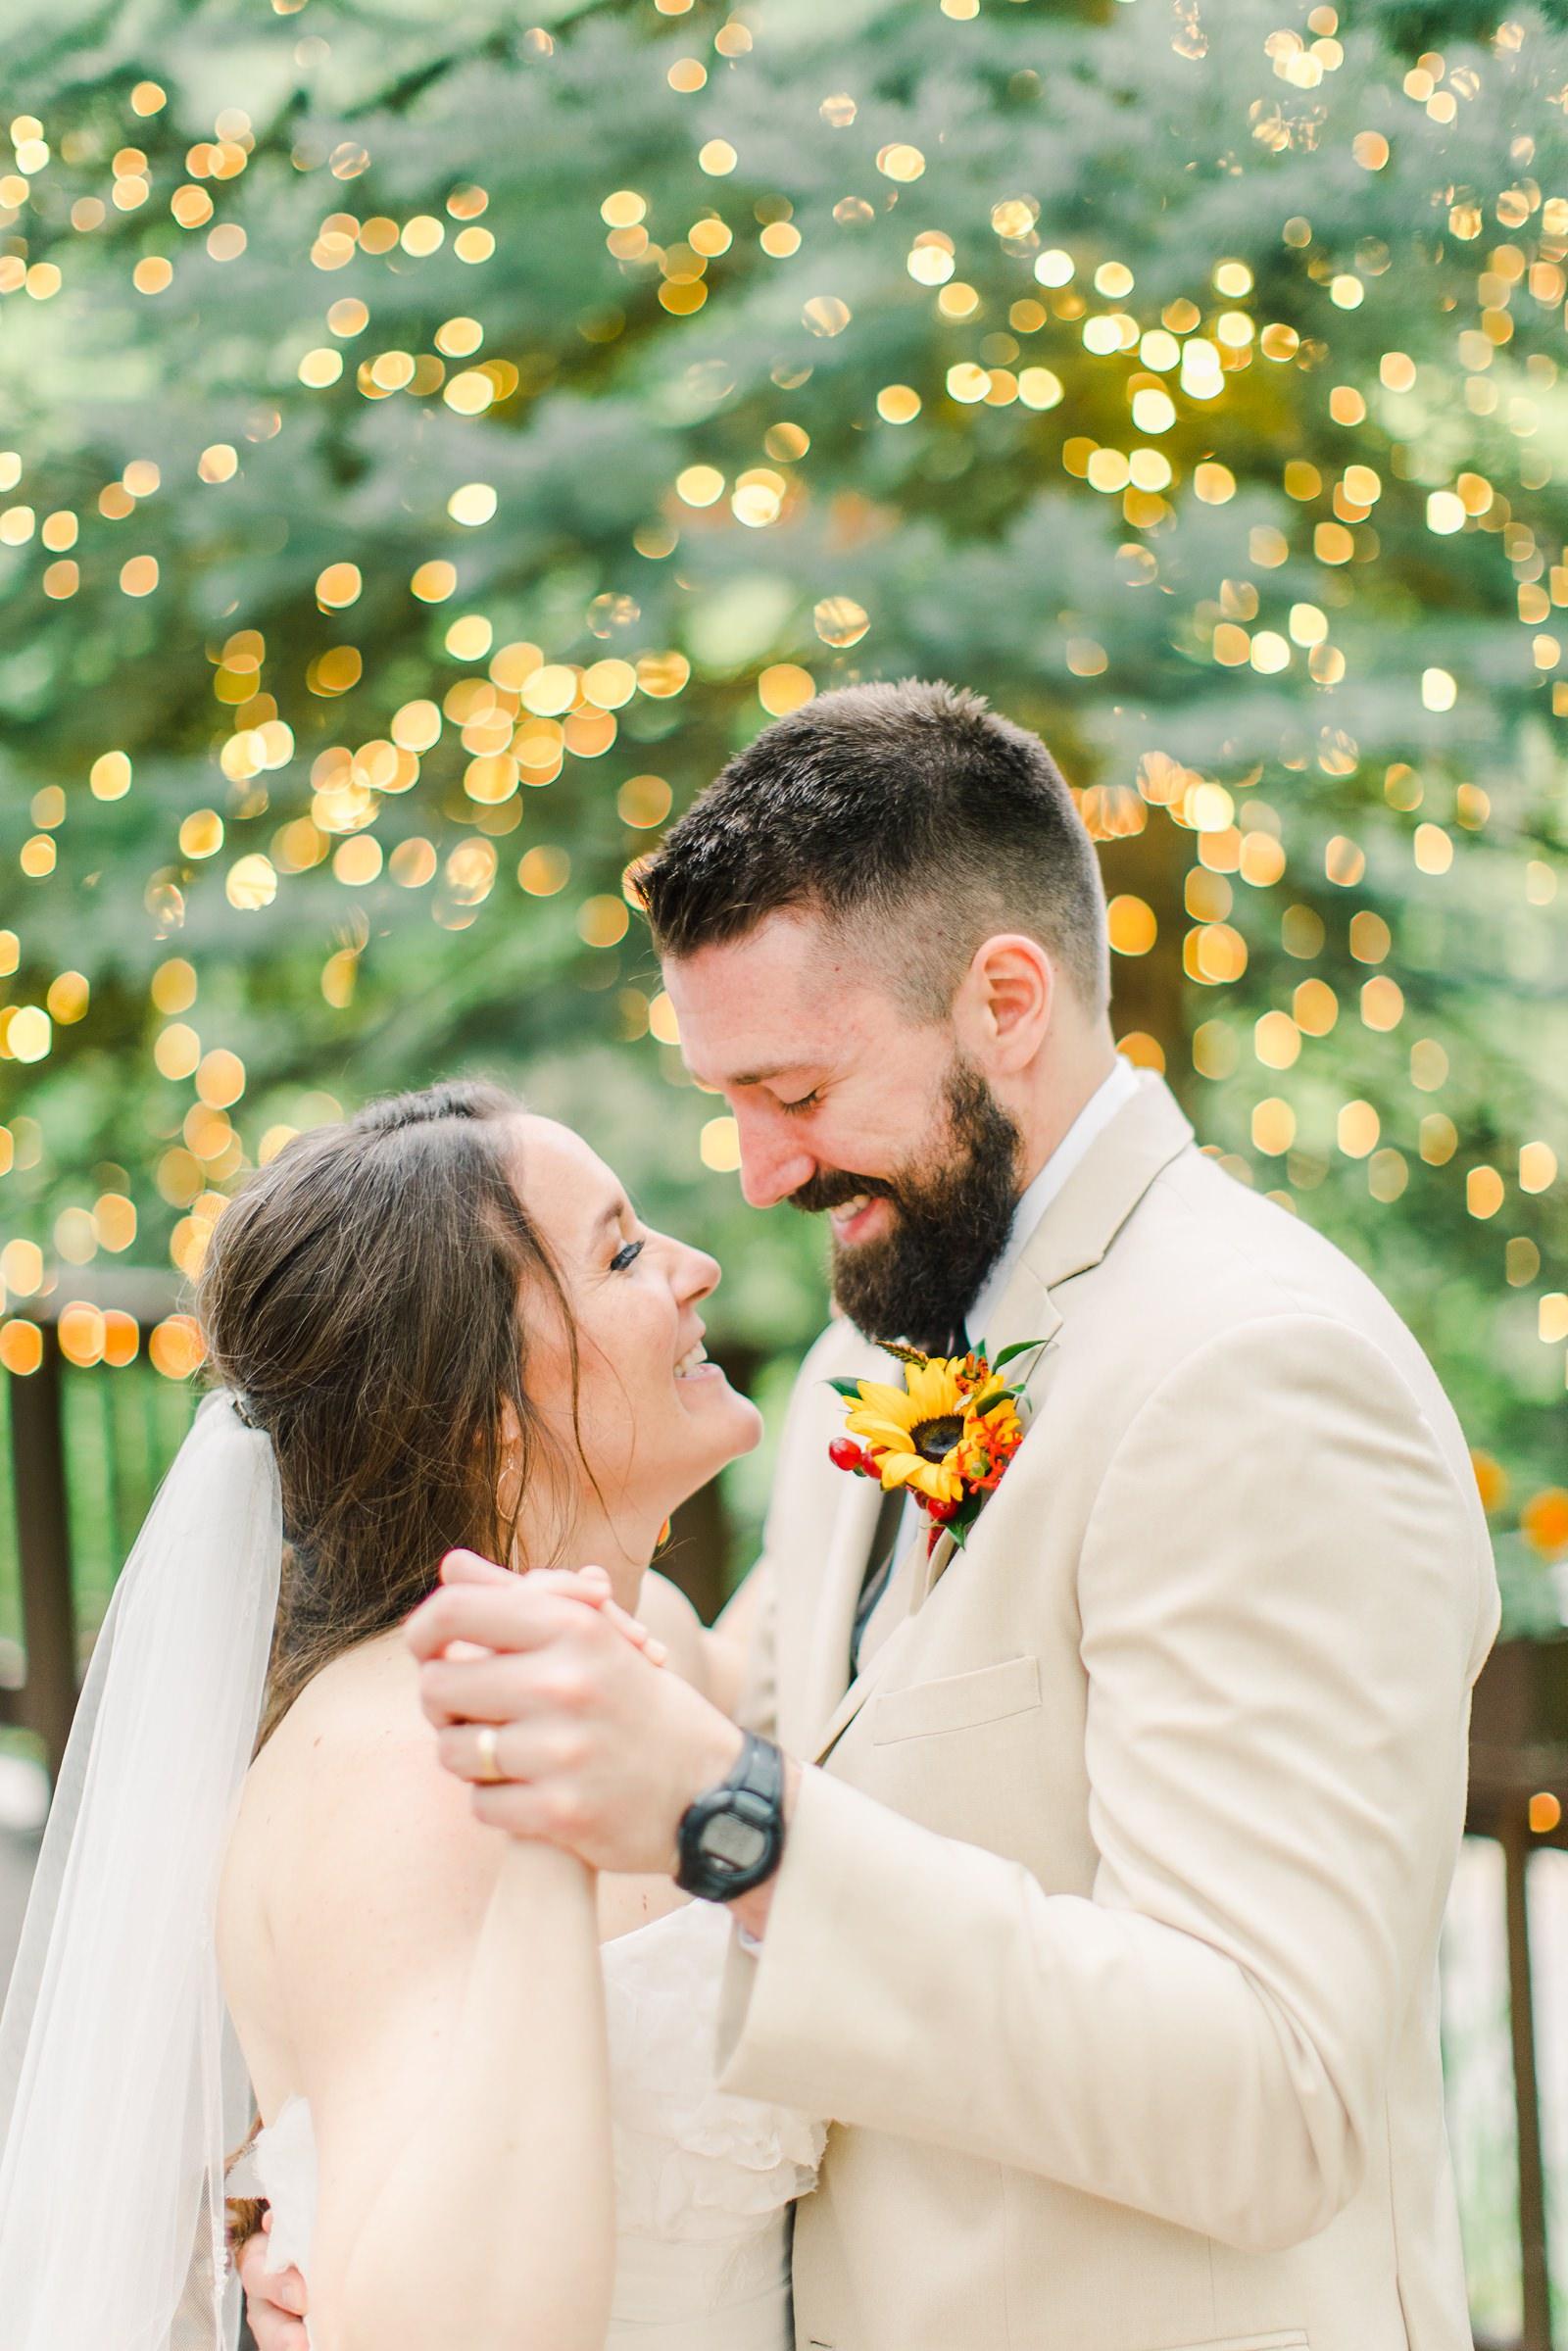 Millcreek Inn Summer Wedding, Utah wedding photography Millcreek Canyon, Salt Lake City, bride and groom first dance twinkle garden lights